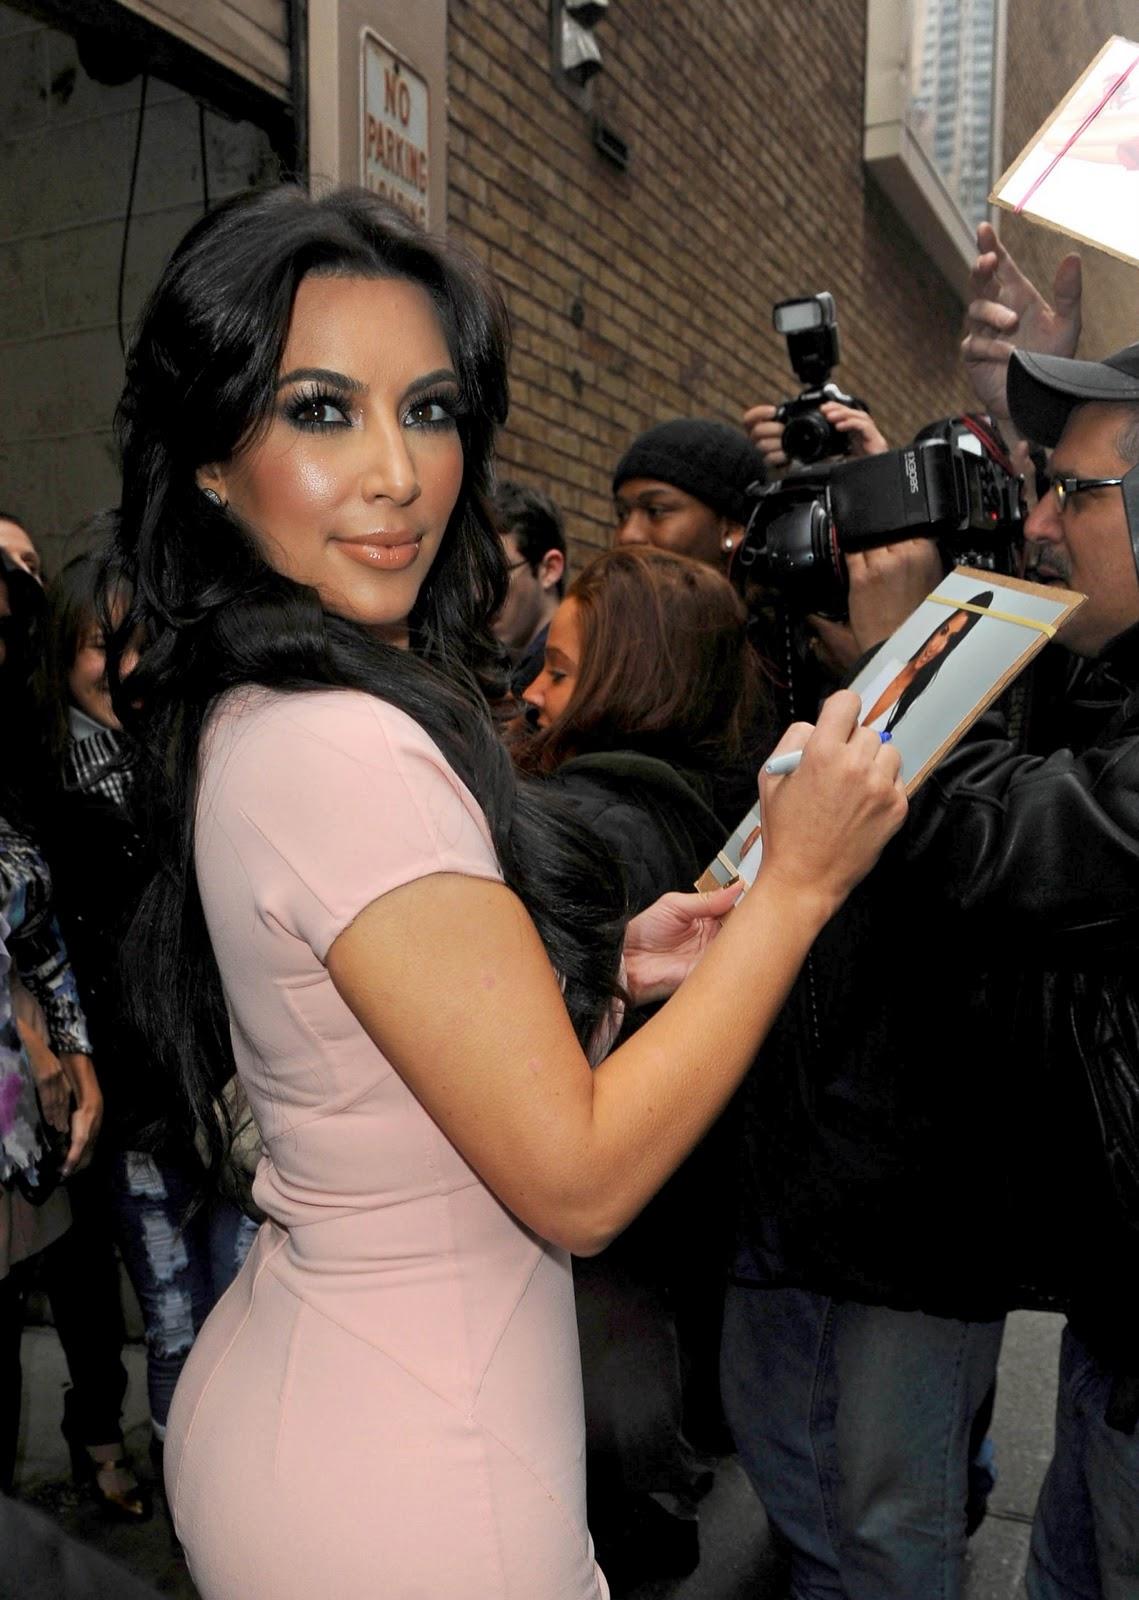 http://4.bp.blogspot.com/_qSI1URO4afE/TTh1G0awWtI/AAAAAAAAHwk/Pi2OPOSRYrs/s1600/Kim-Kardashian-56.jpg